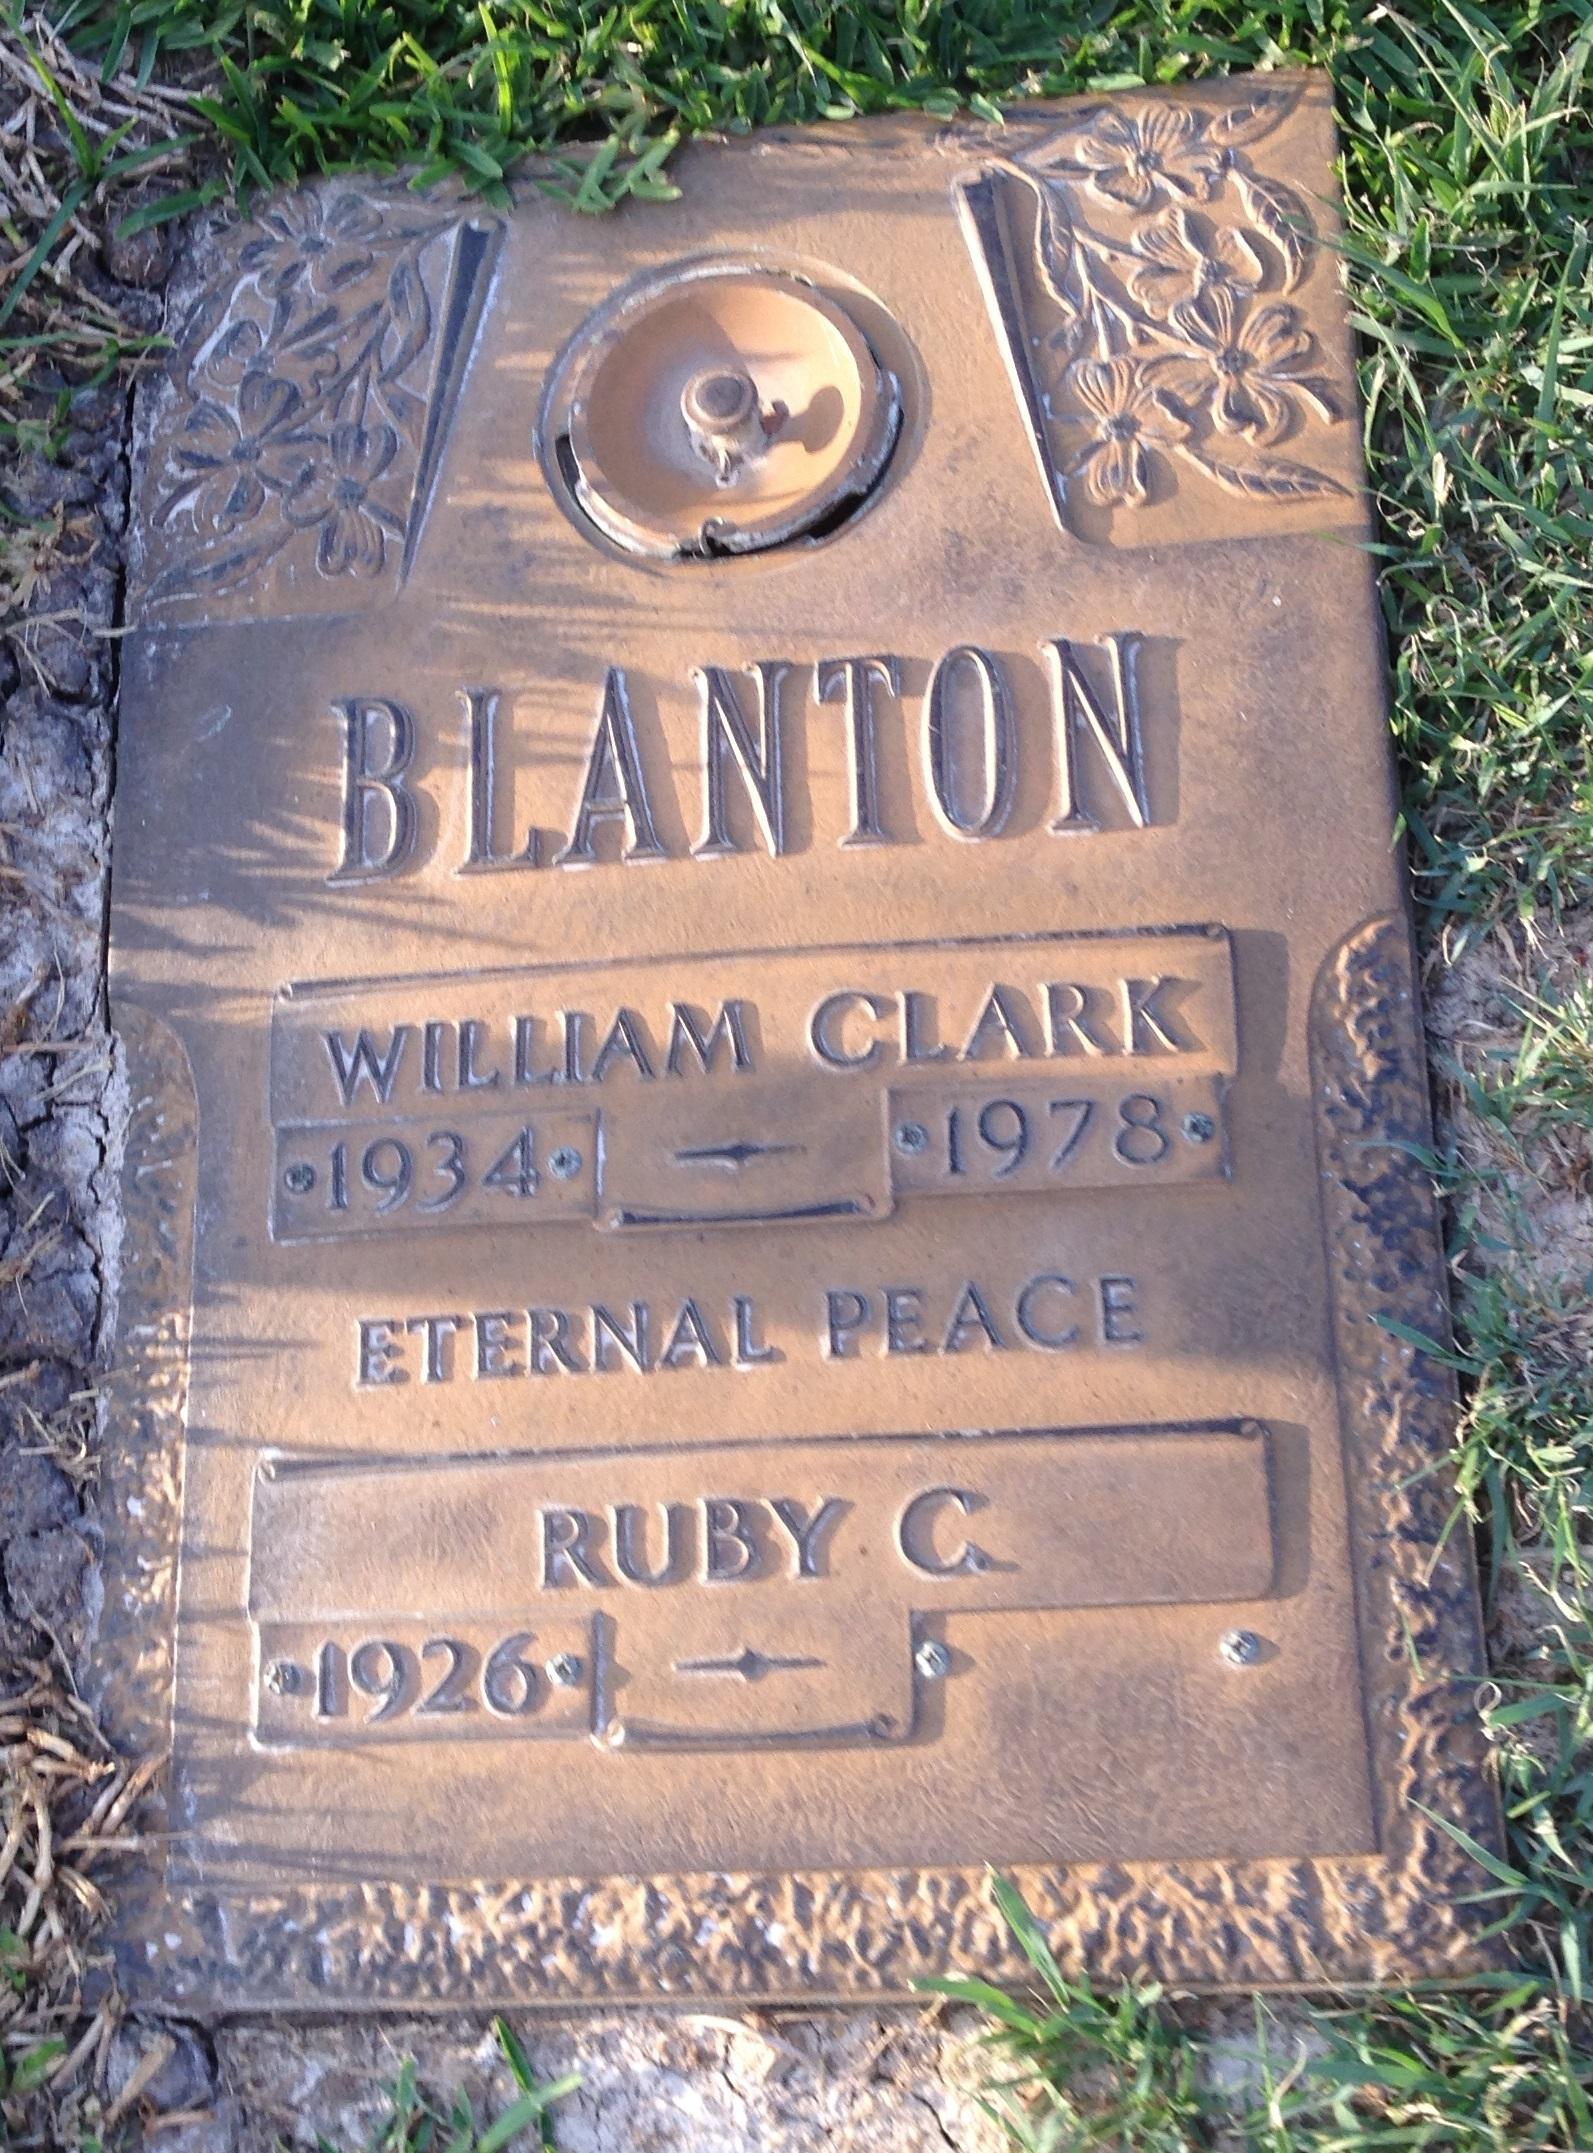 William Clark Bill Blanton